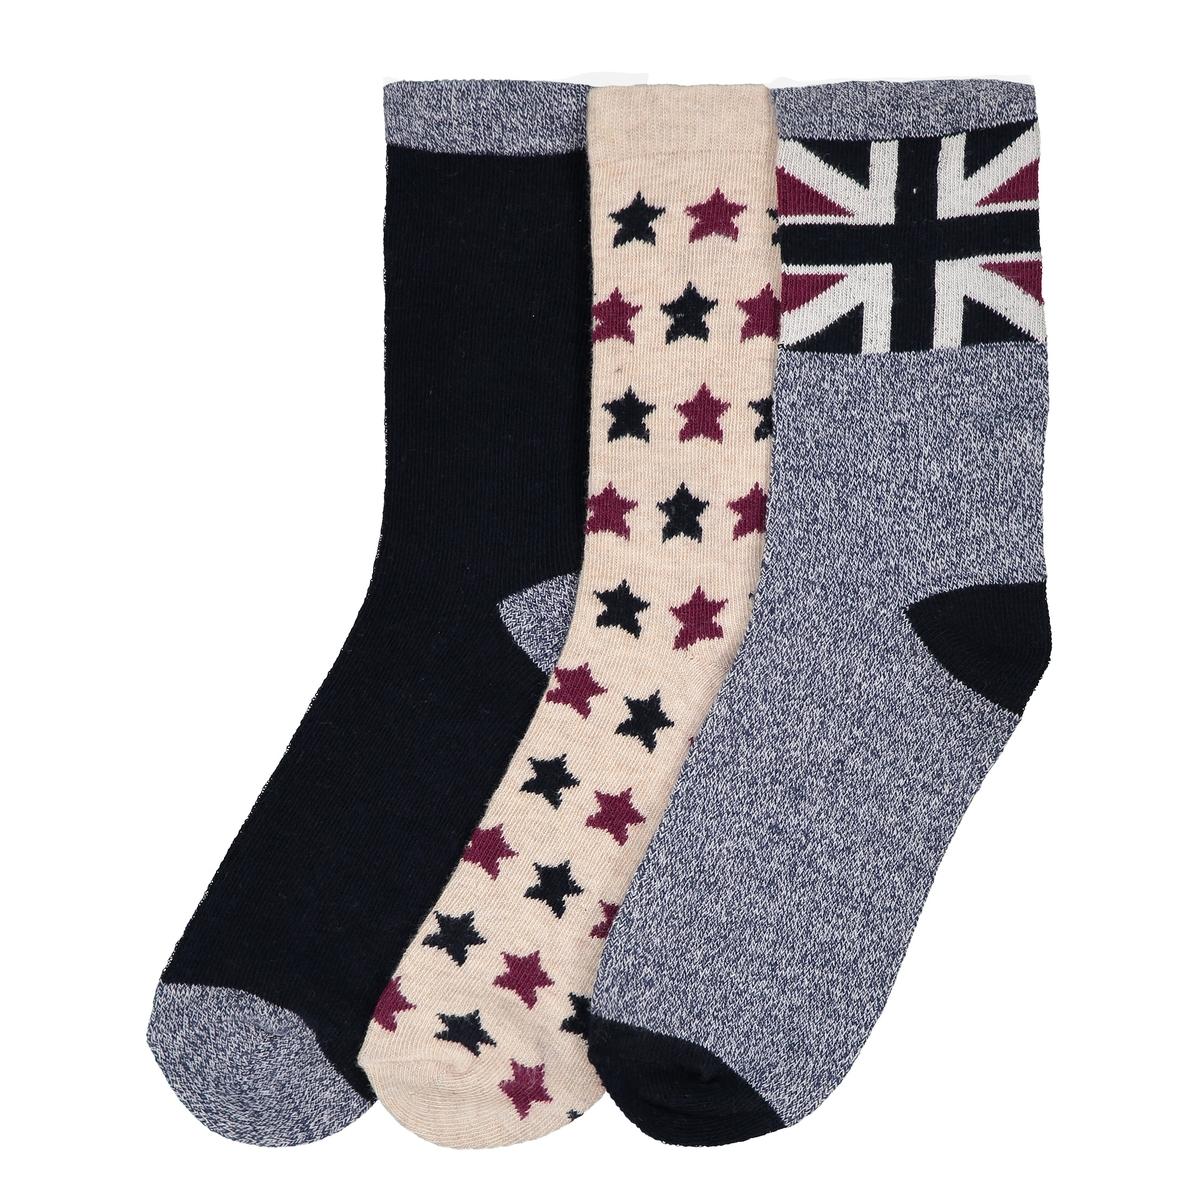 цена на Комплект из пар носков La Redoute Высоких - 27/30 синий